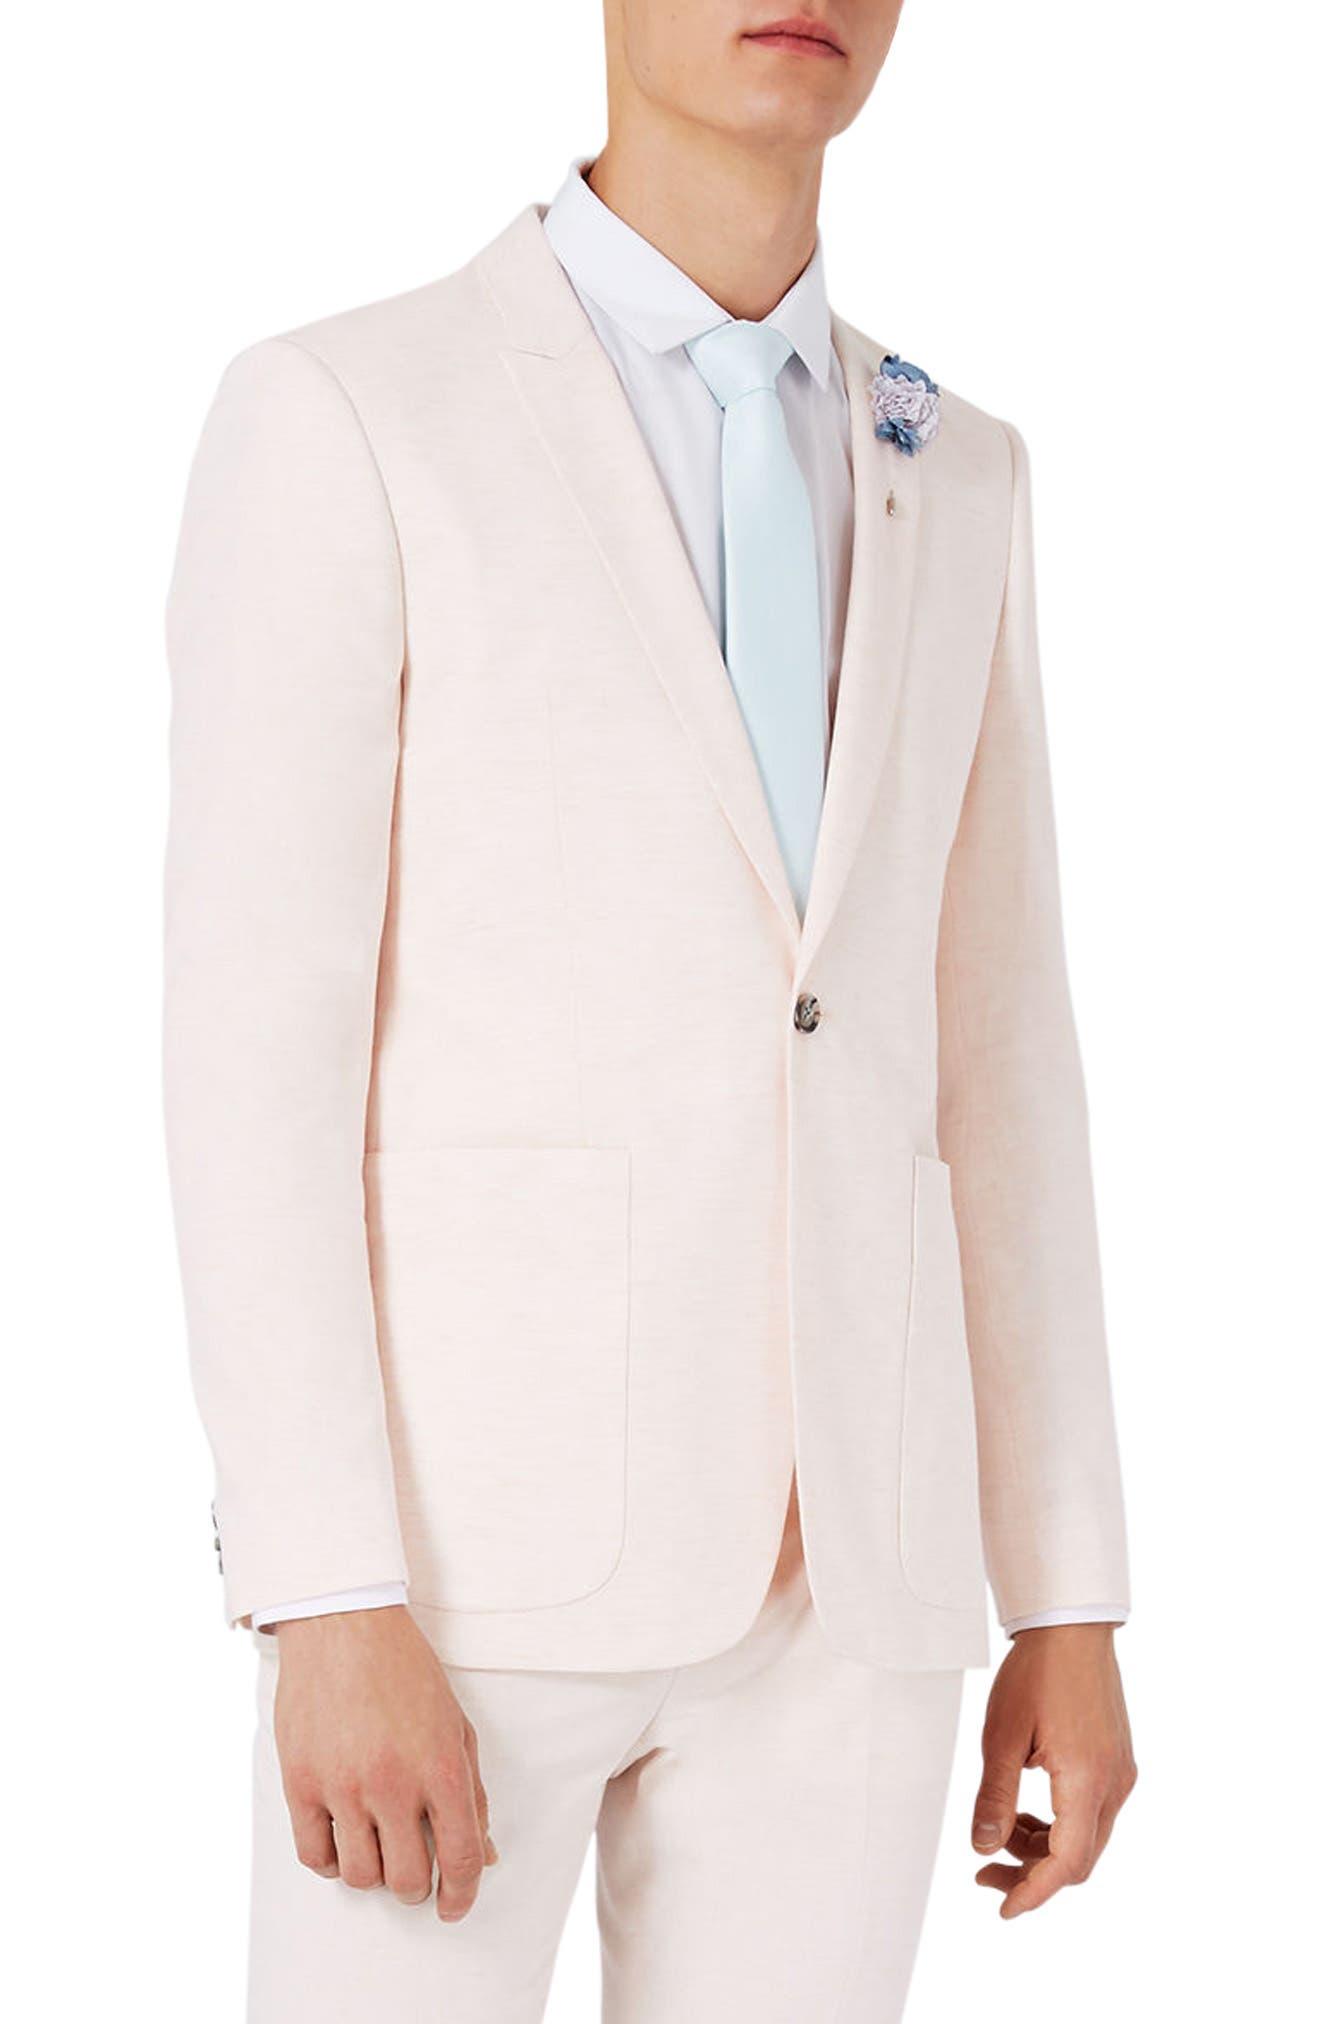 Topman Lightweight Skinny Fit Suit Jacket